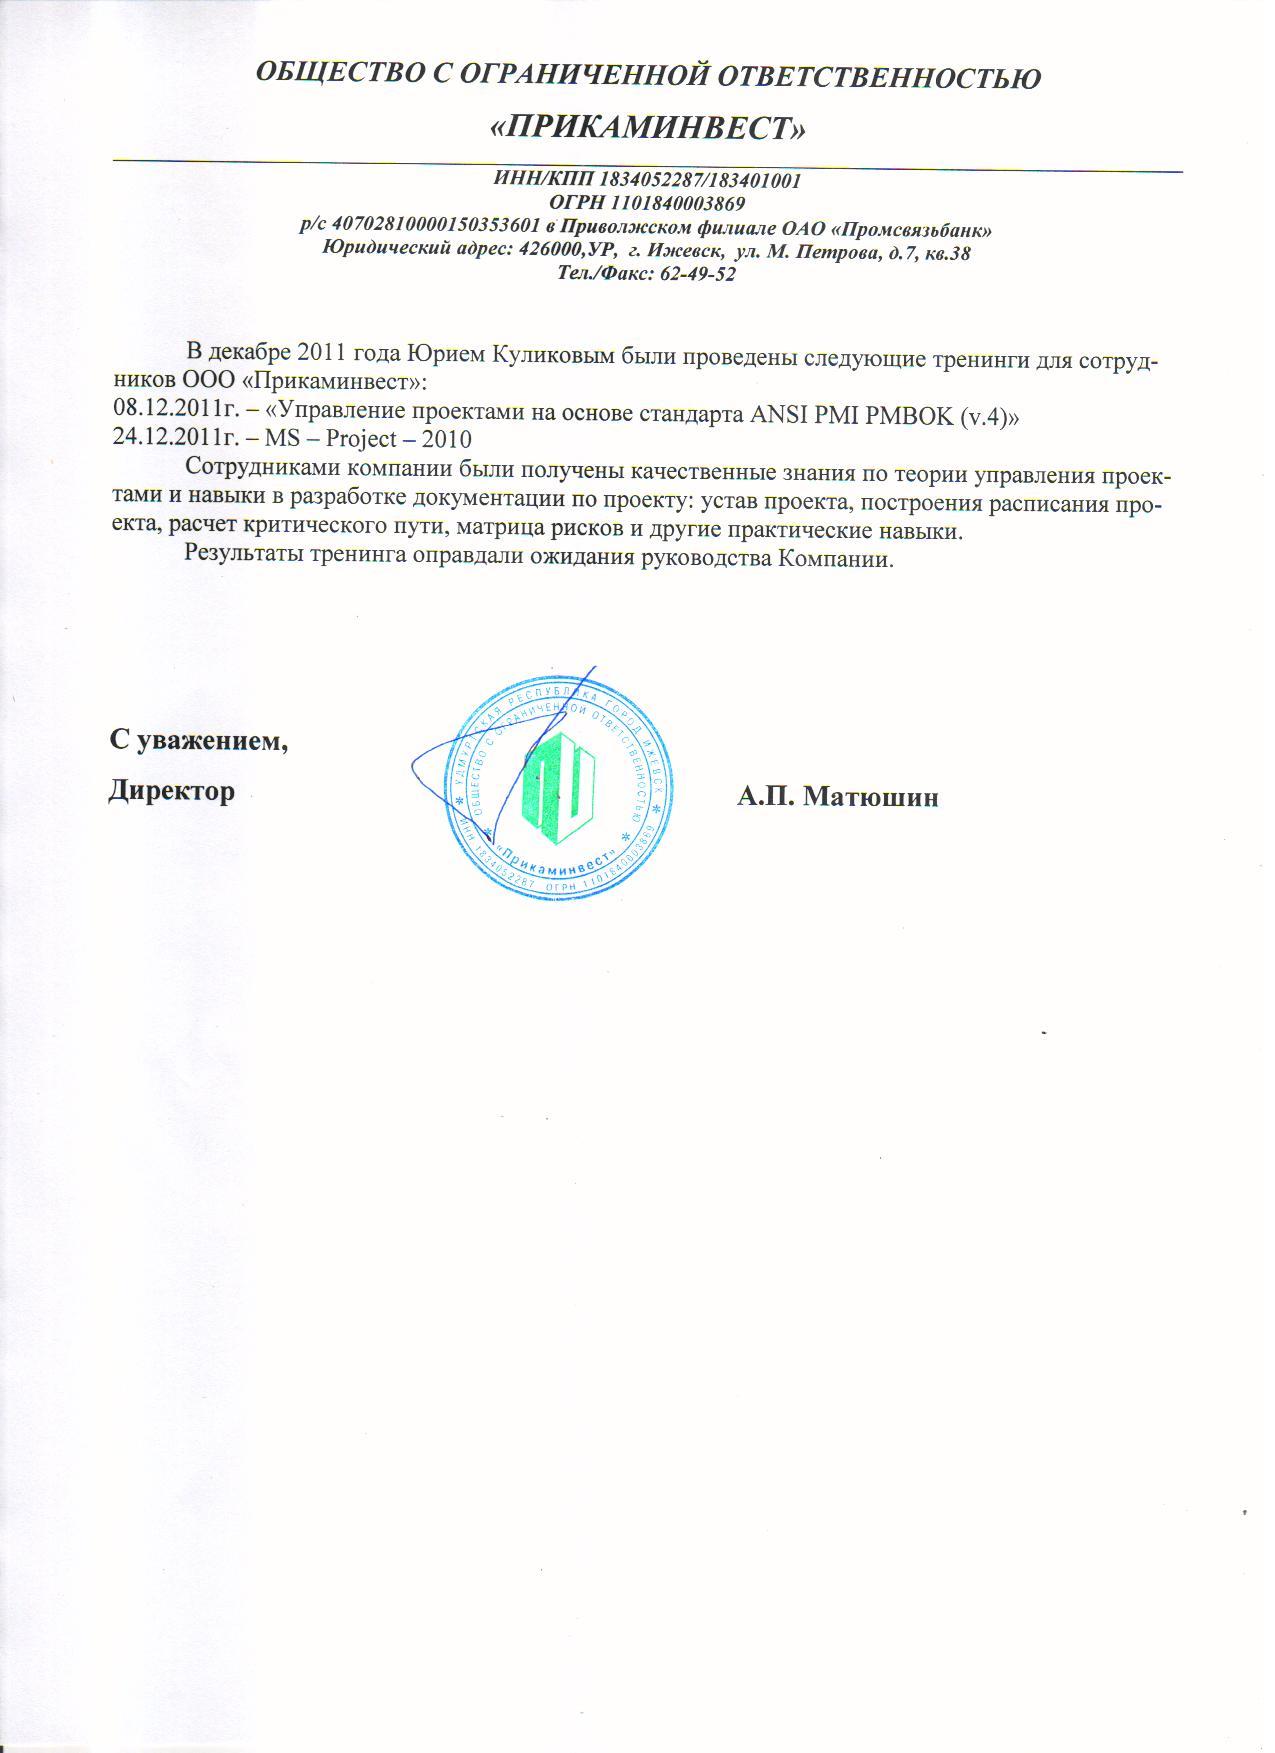 Photo: Отзыв Прикаминвест.  В этой компании проведено подряд 2 тренинга: по стандарту PMBoK и MS Project 2010